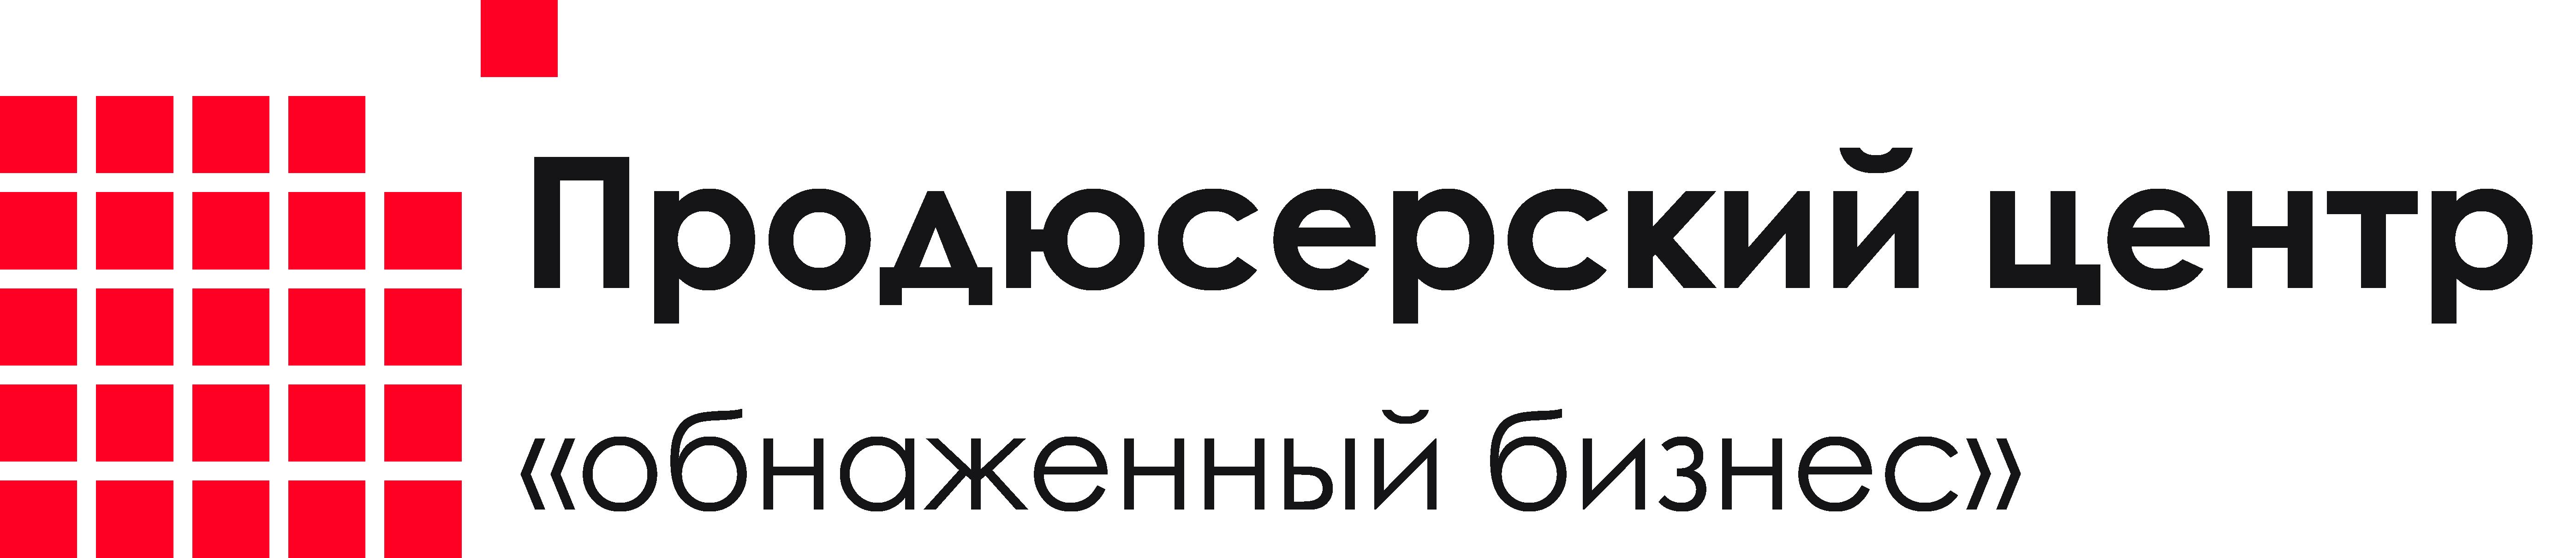 "Логотип для продюсерского центра ""Обнажённый бизнес"" фото f_6445b9d171c25f04.png"